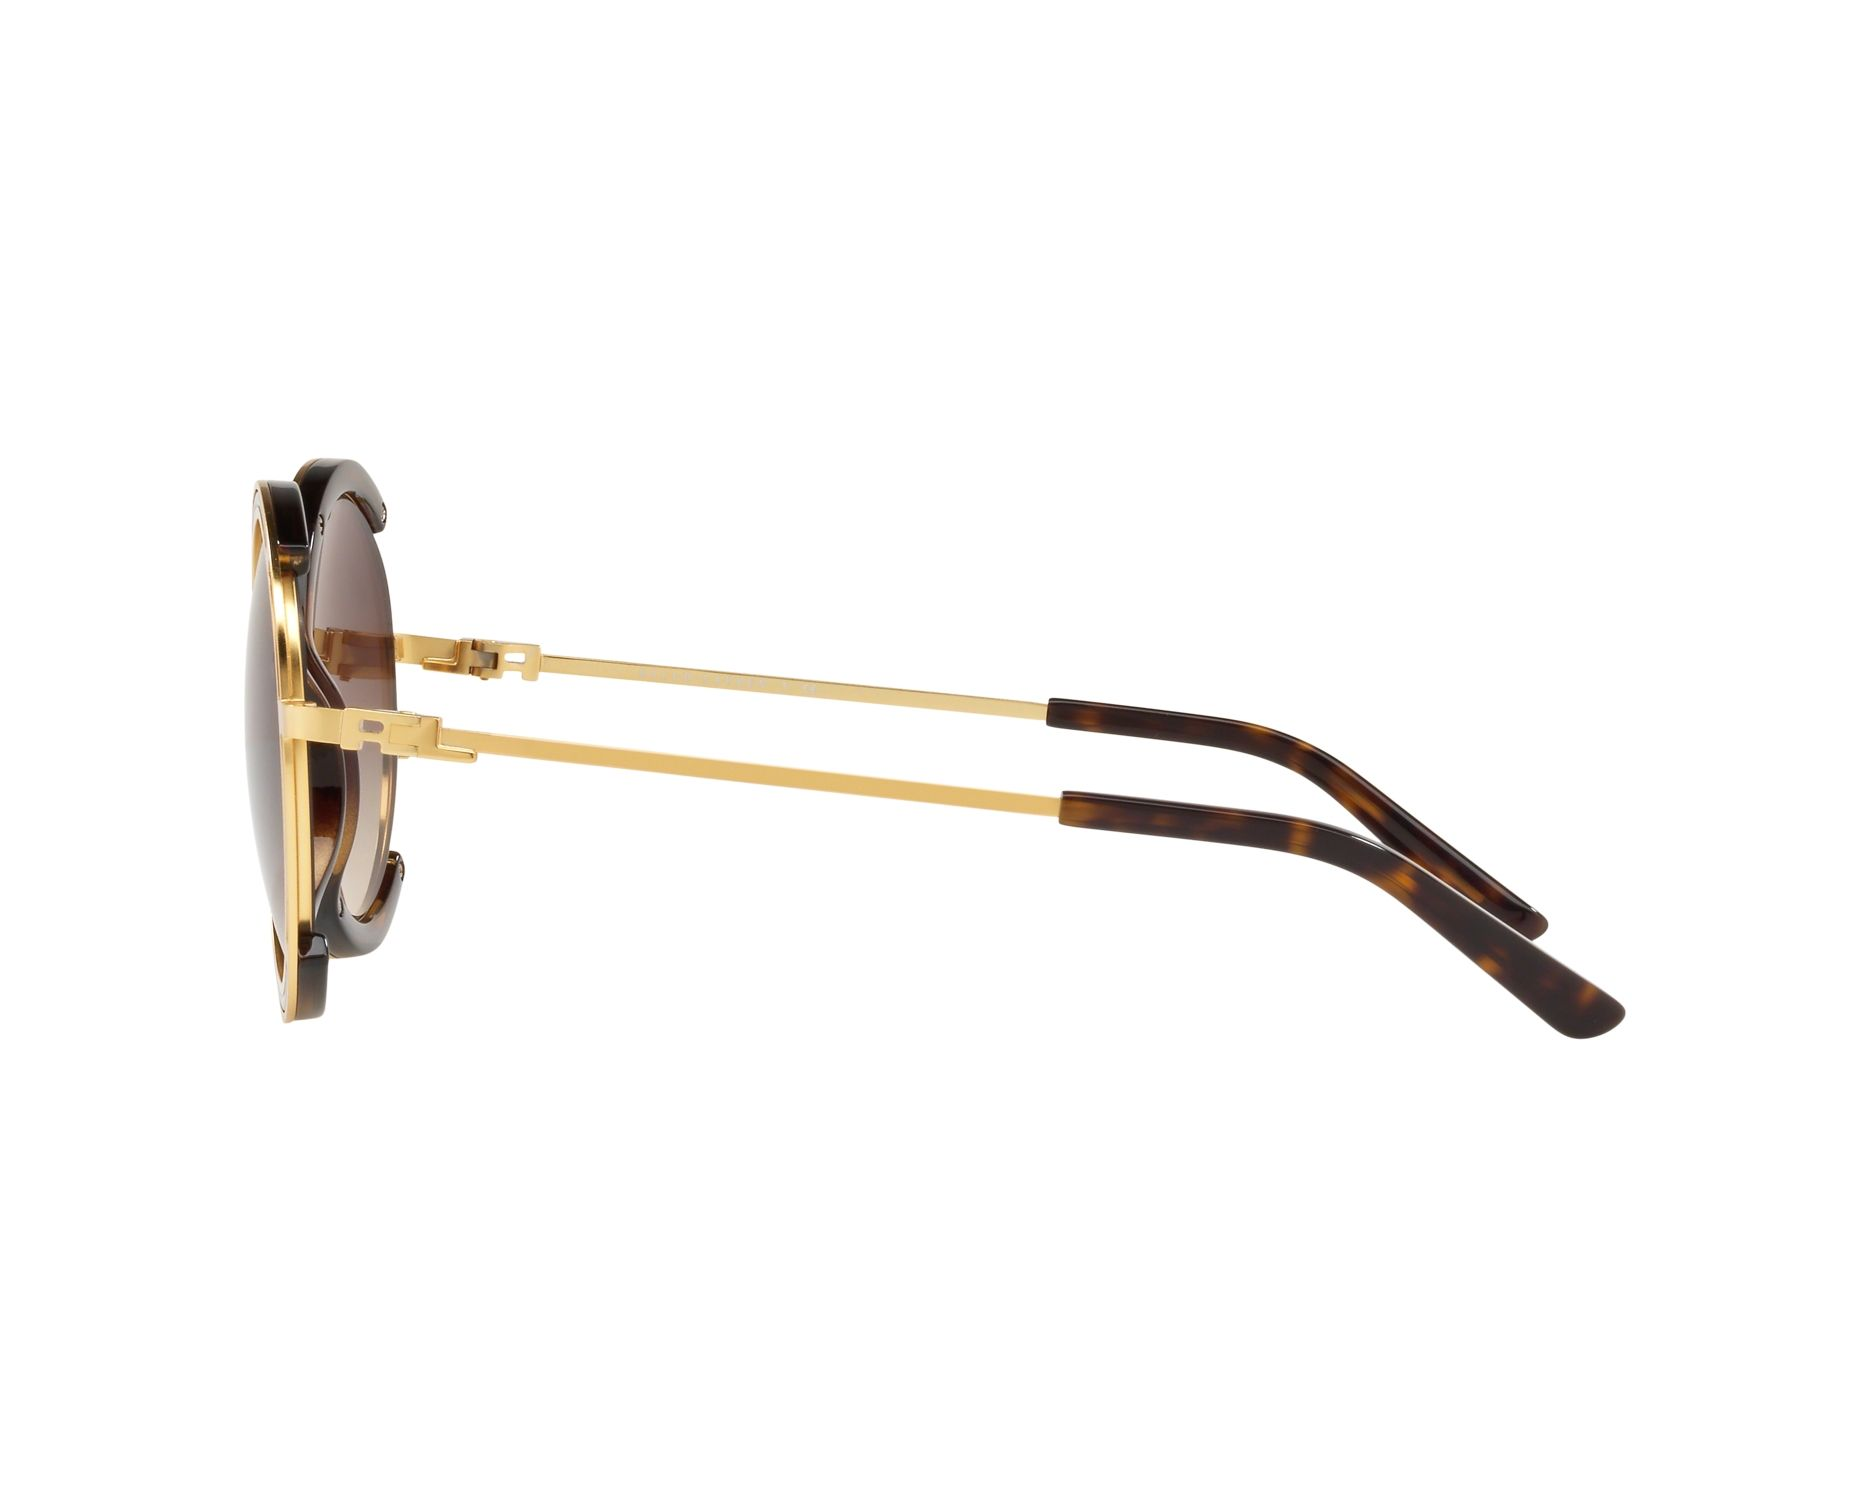 97ab426cc5a Sunglasses Ralph Lauren RL-7060 934813 53-20 Gold Havana 360 degree view 4